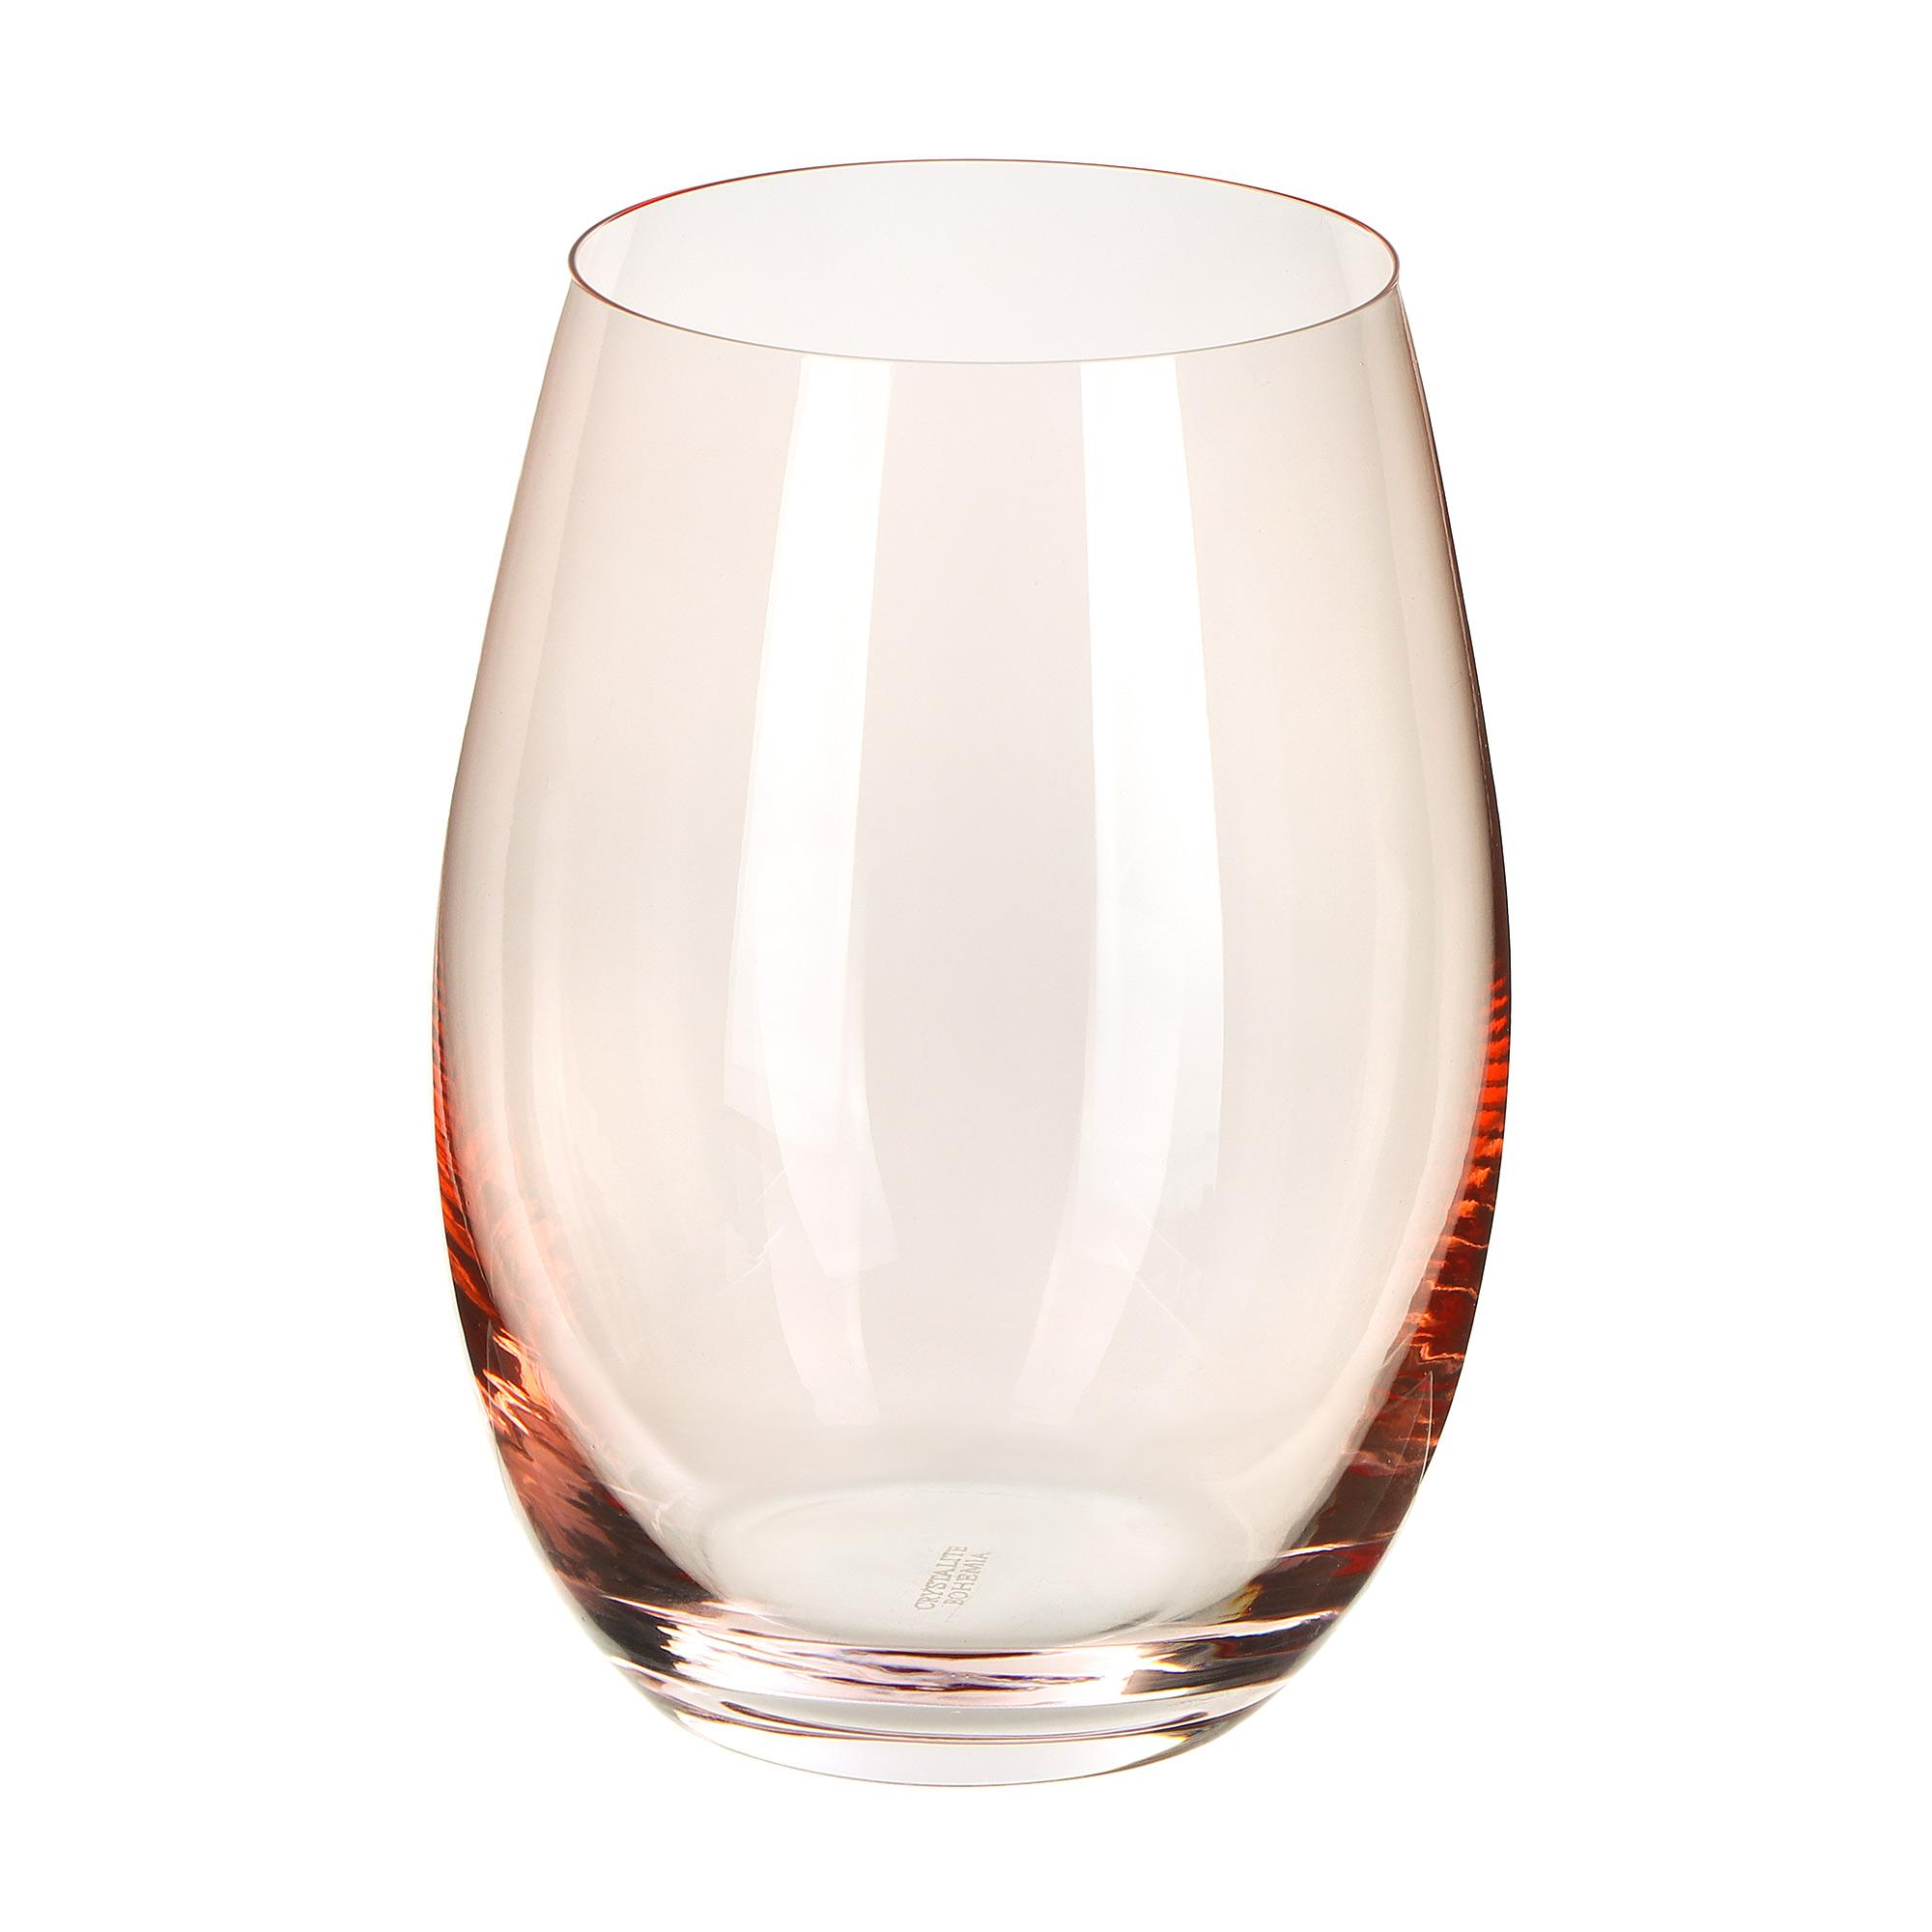 Набор стаканов Crystalite Bohemia Mergus 560 мл 6 шт набор стаканов 410 мл 6 шт crystalite bohemia набор стаканов 410 мл 6 шт